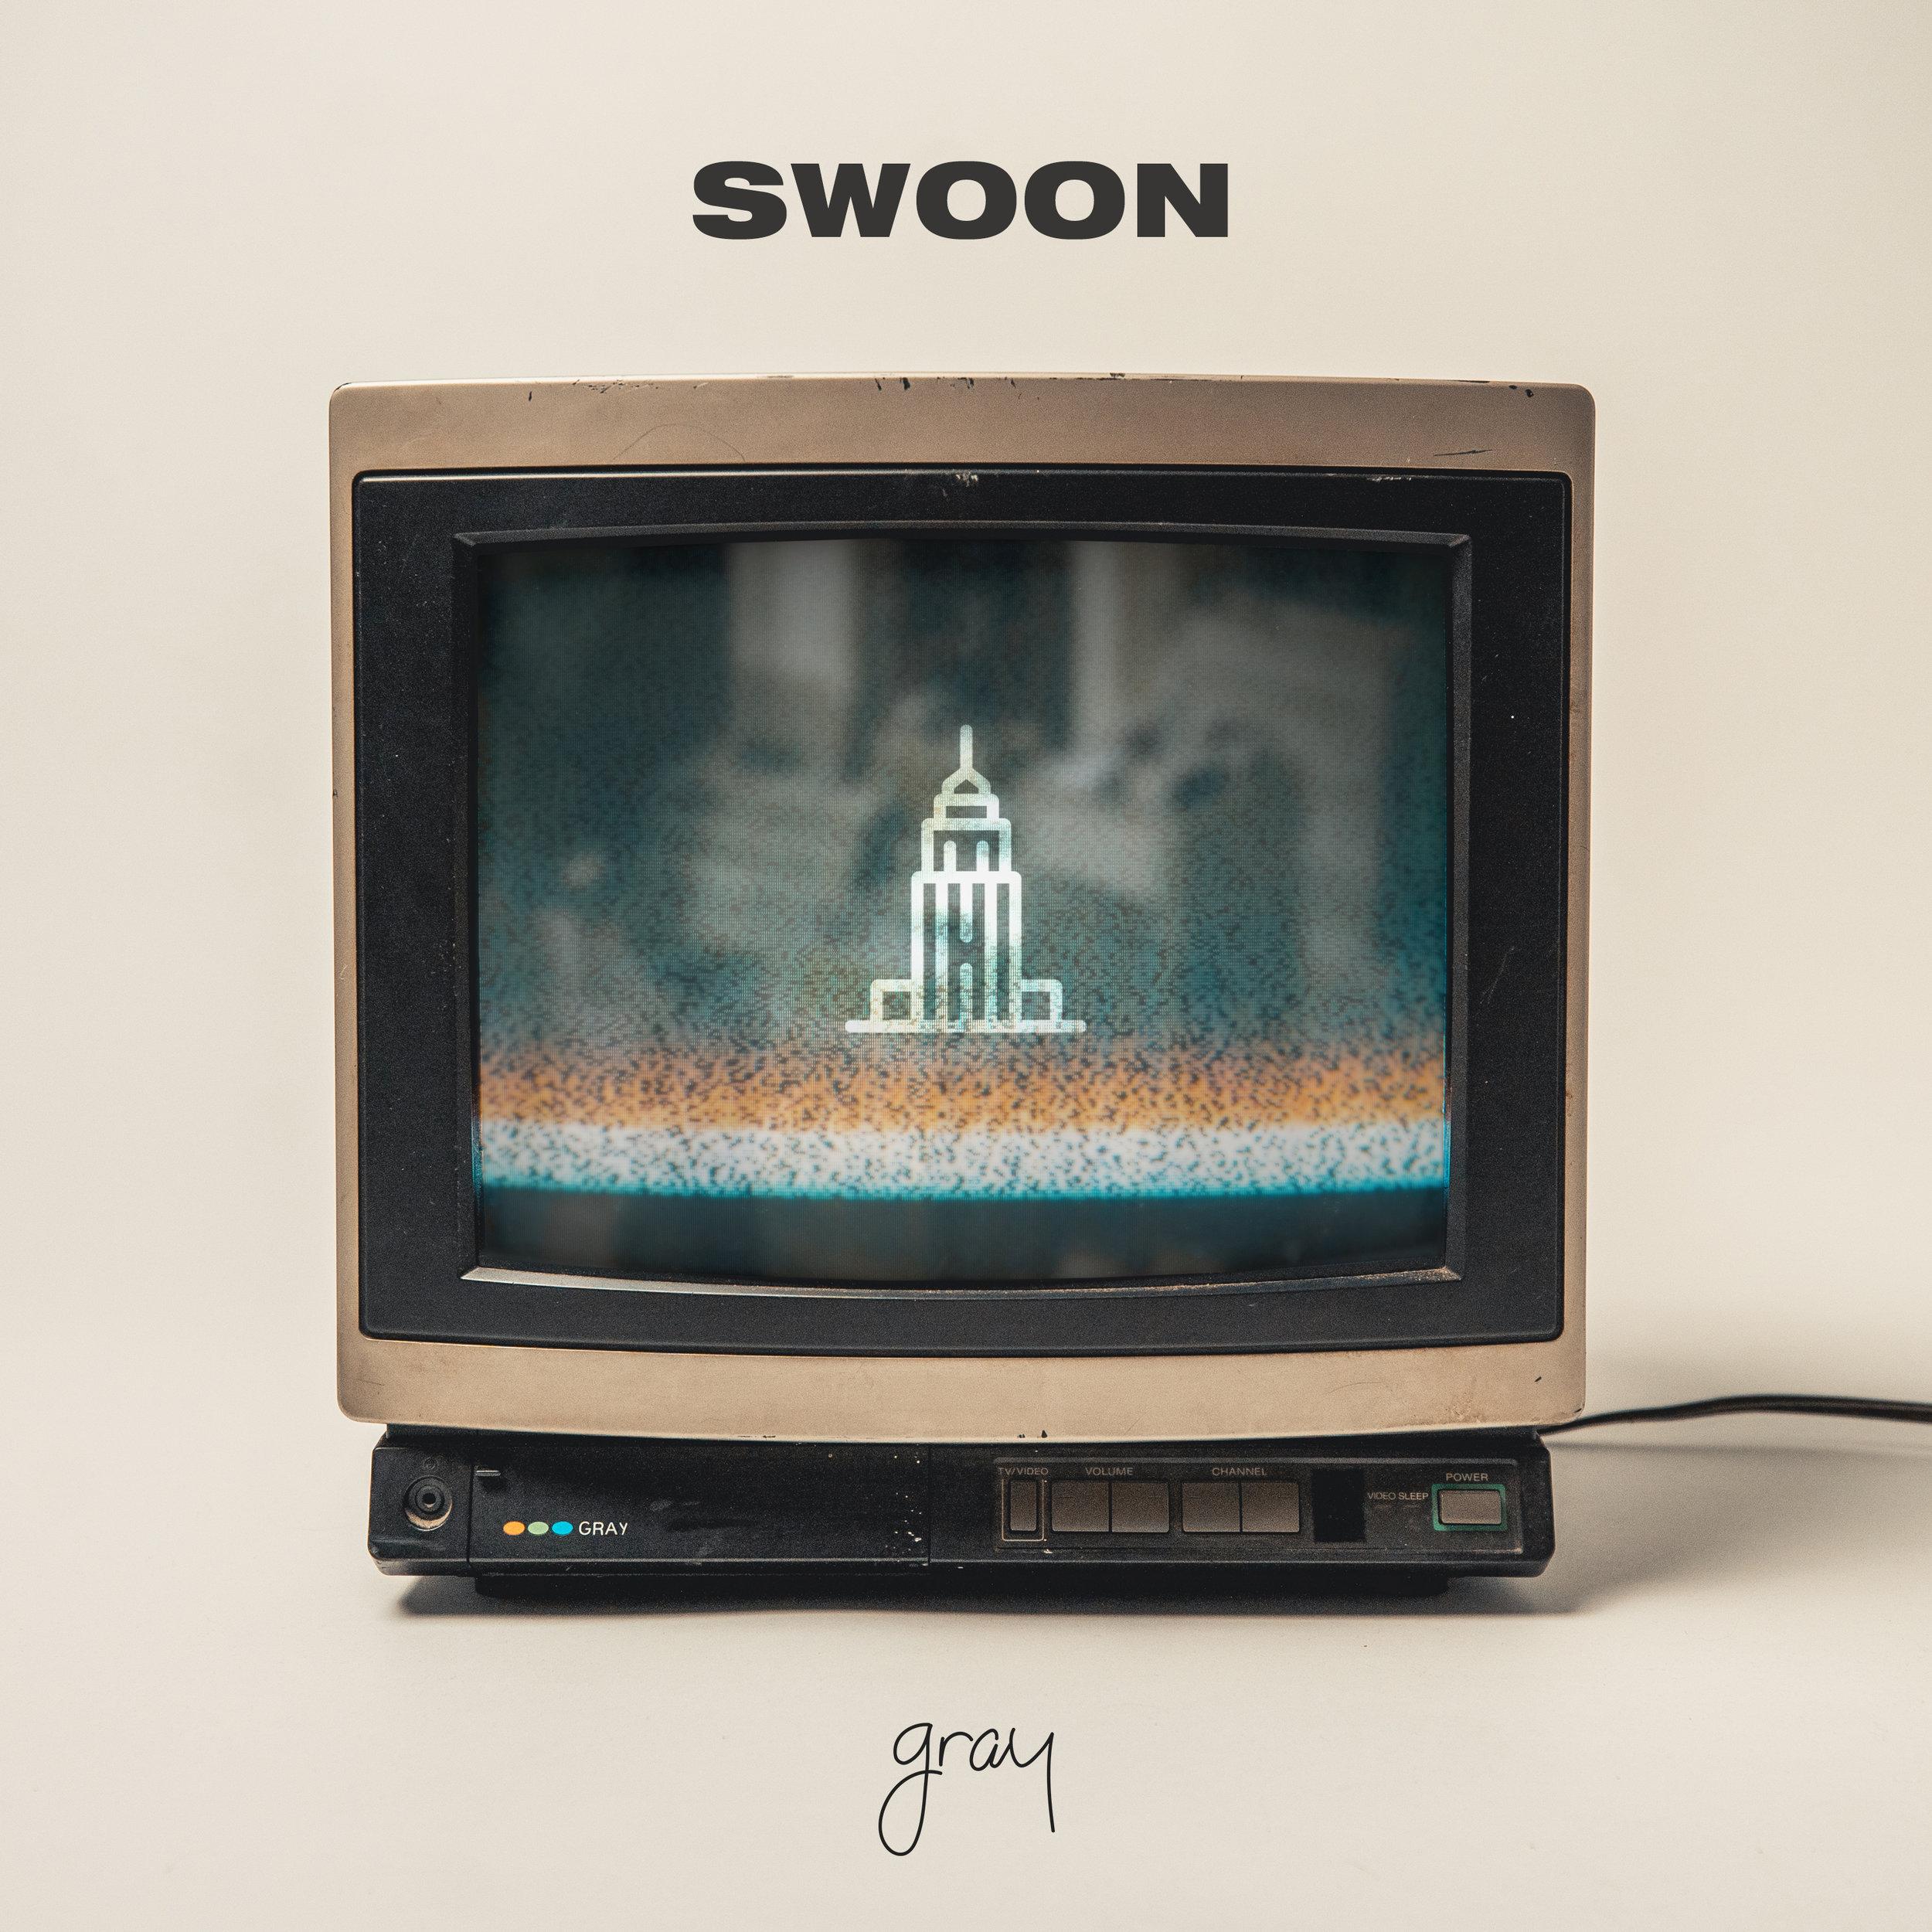 SWOON     // GRAY -    created by Daniel Carrai